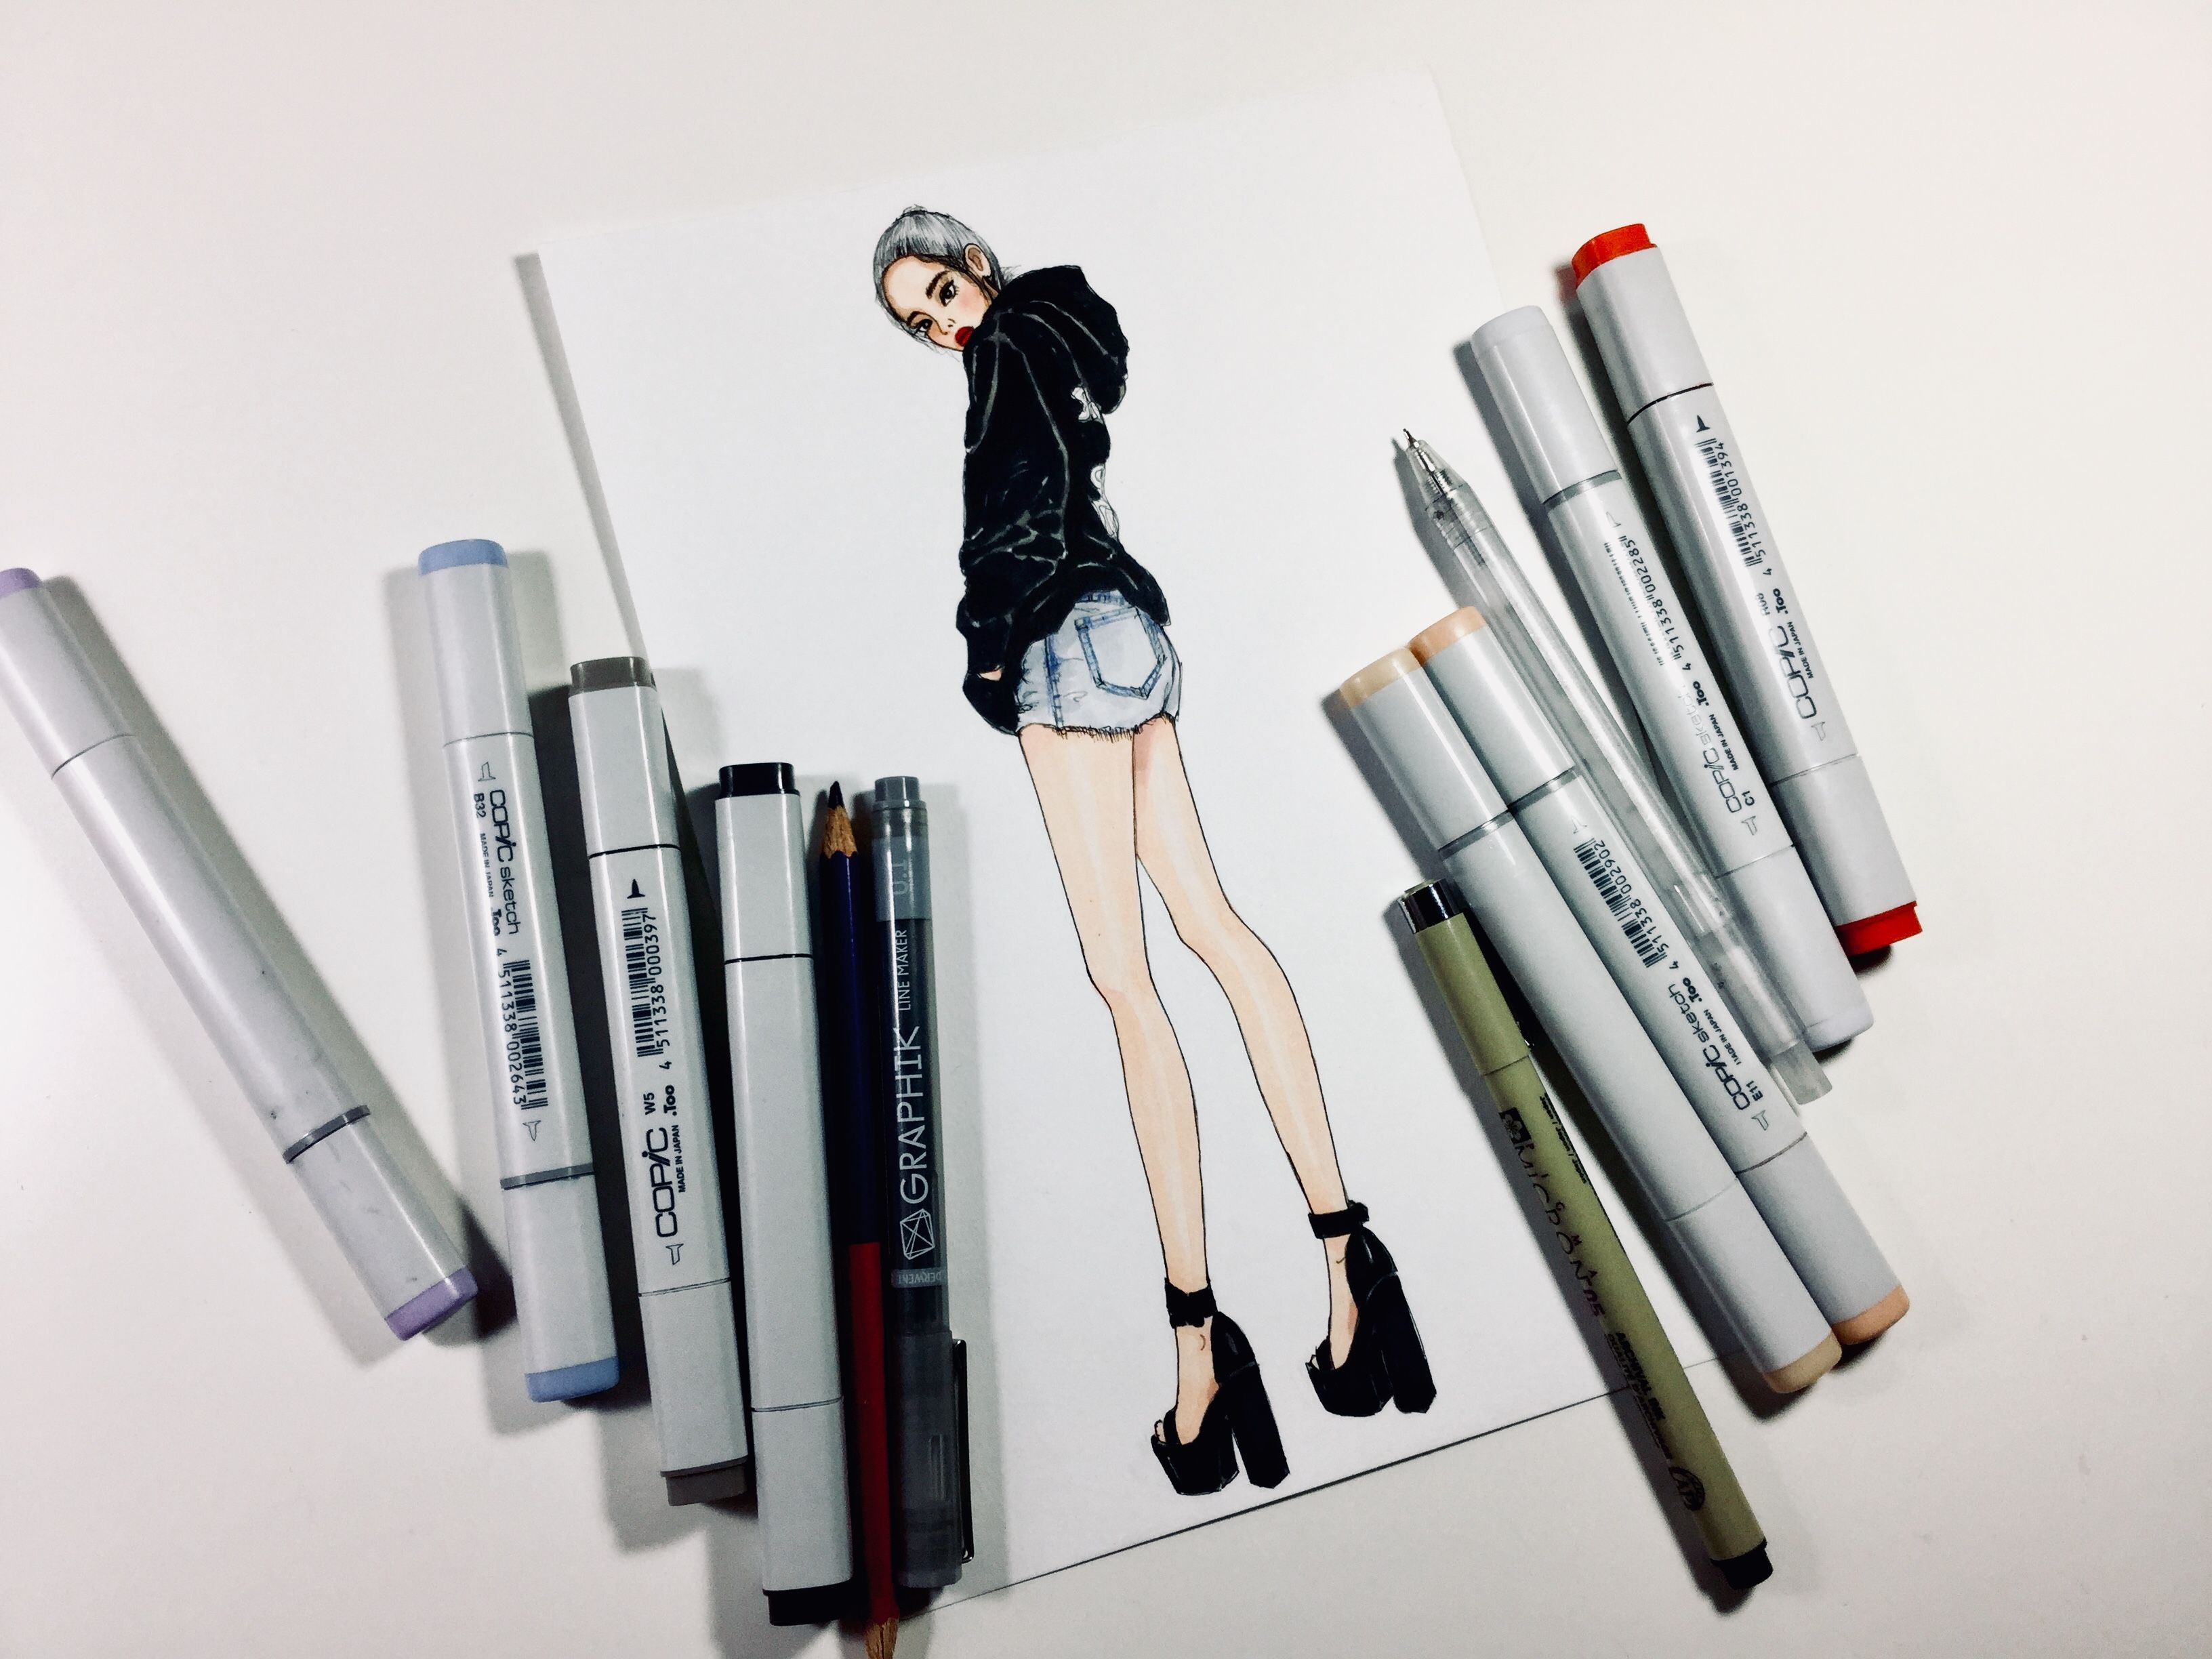 Fashionillustration Fashiondrawing Fashionart Marker Markerart